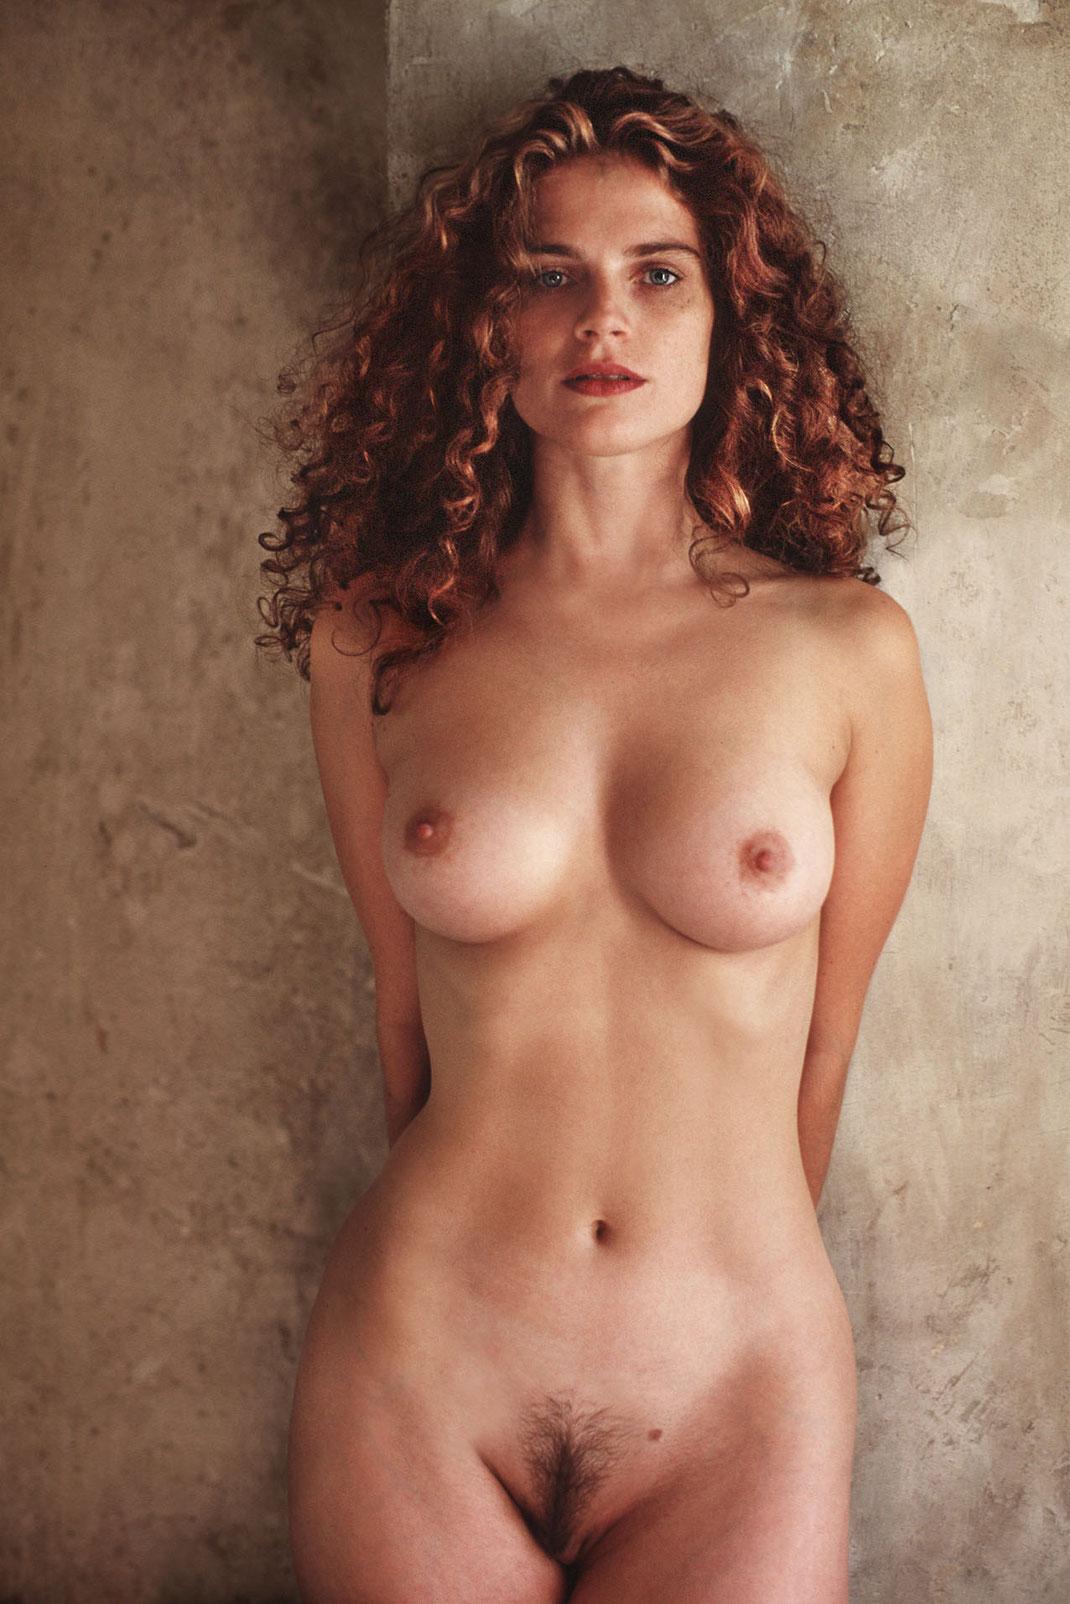 Fine art nude by Martin Boelt Photography